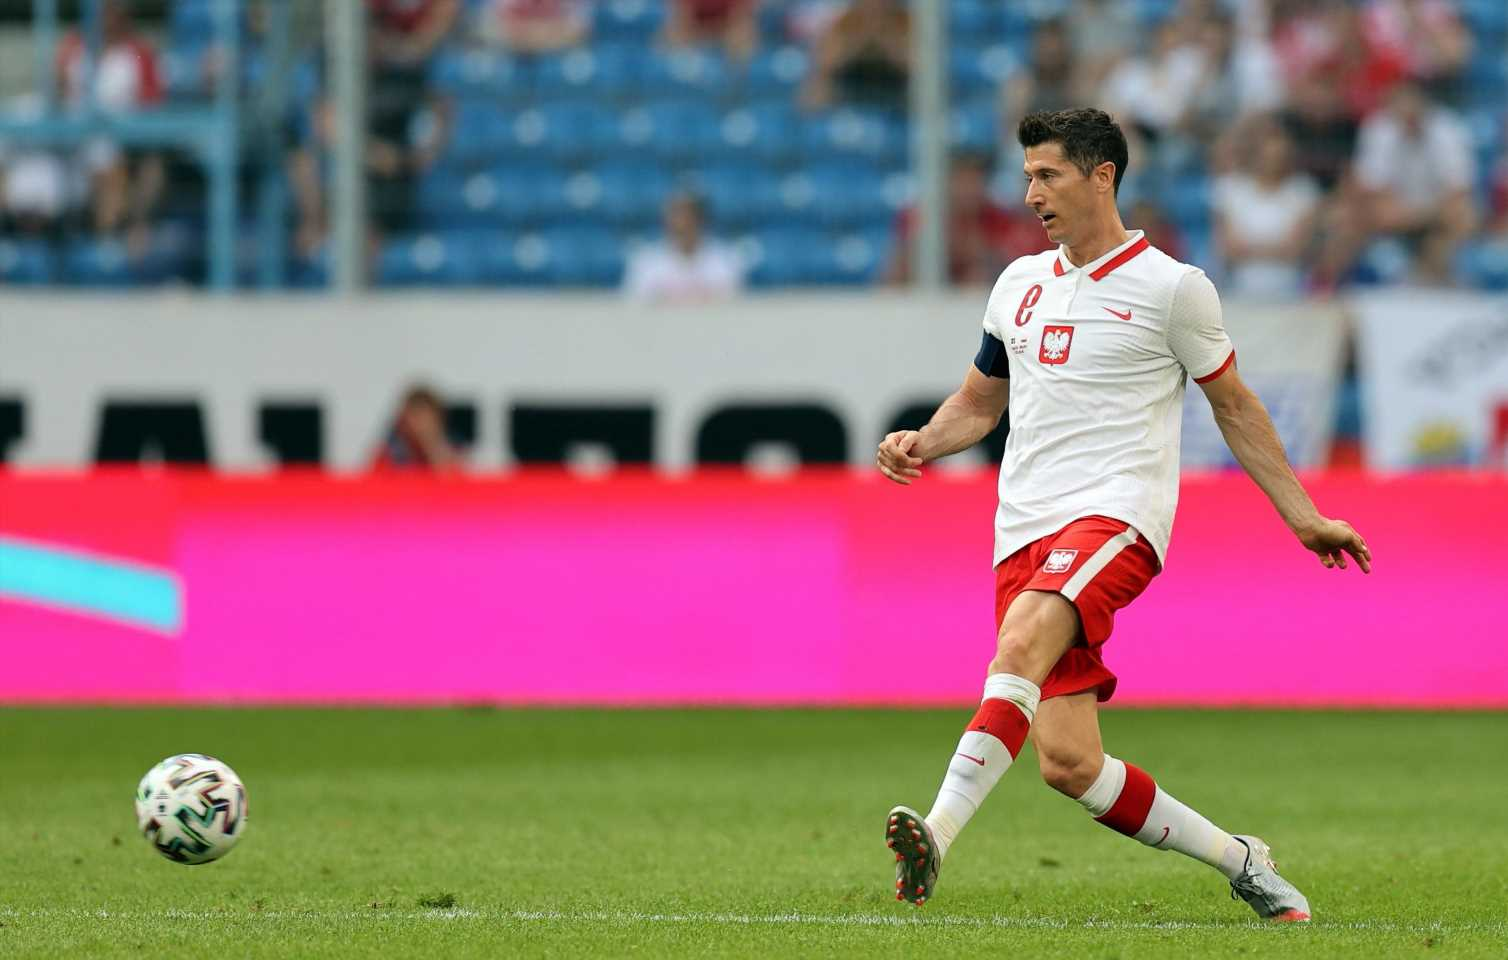 Euro 2021: Can Poland rise to meet Robert Lewandowski?